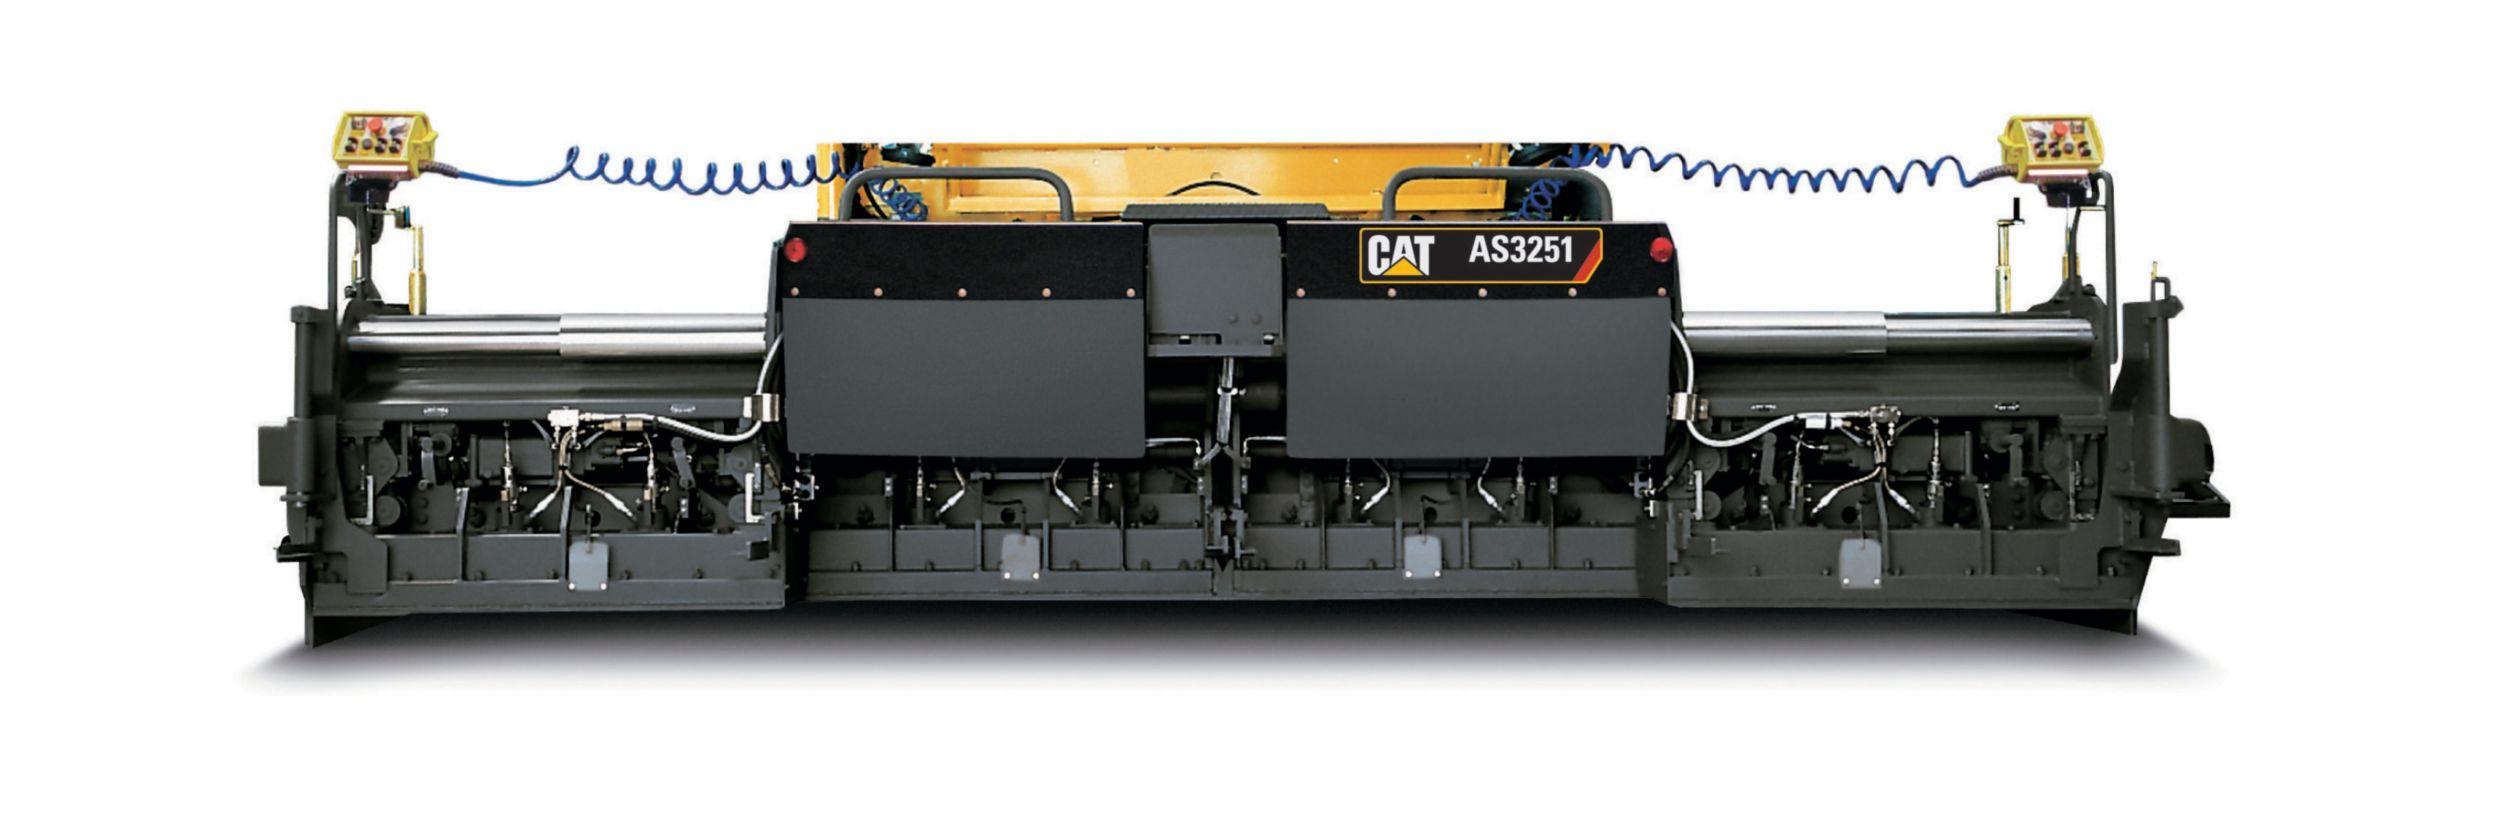 AS3251